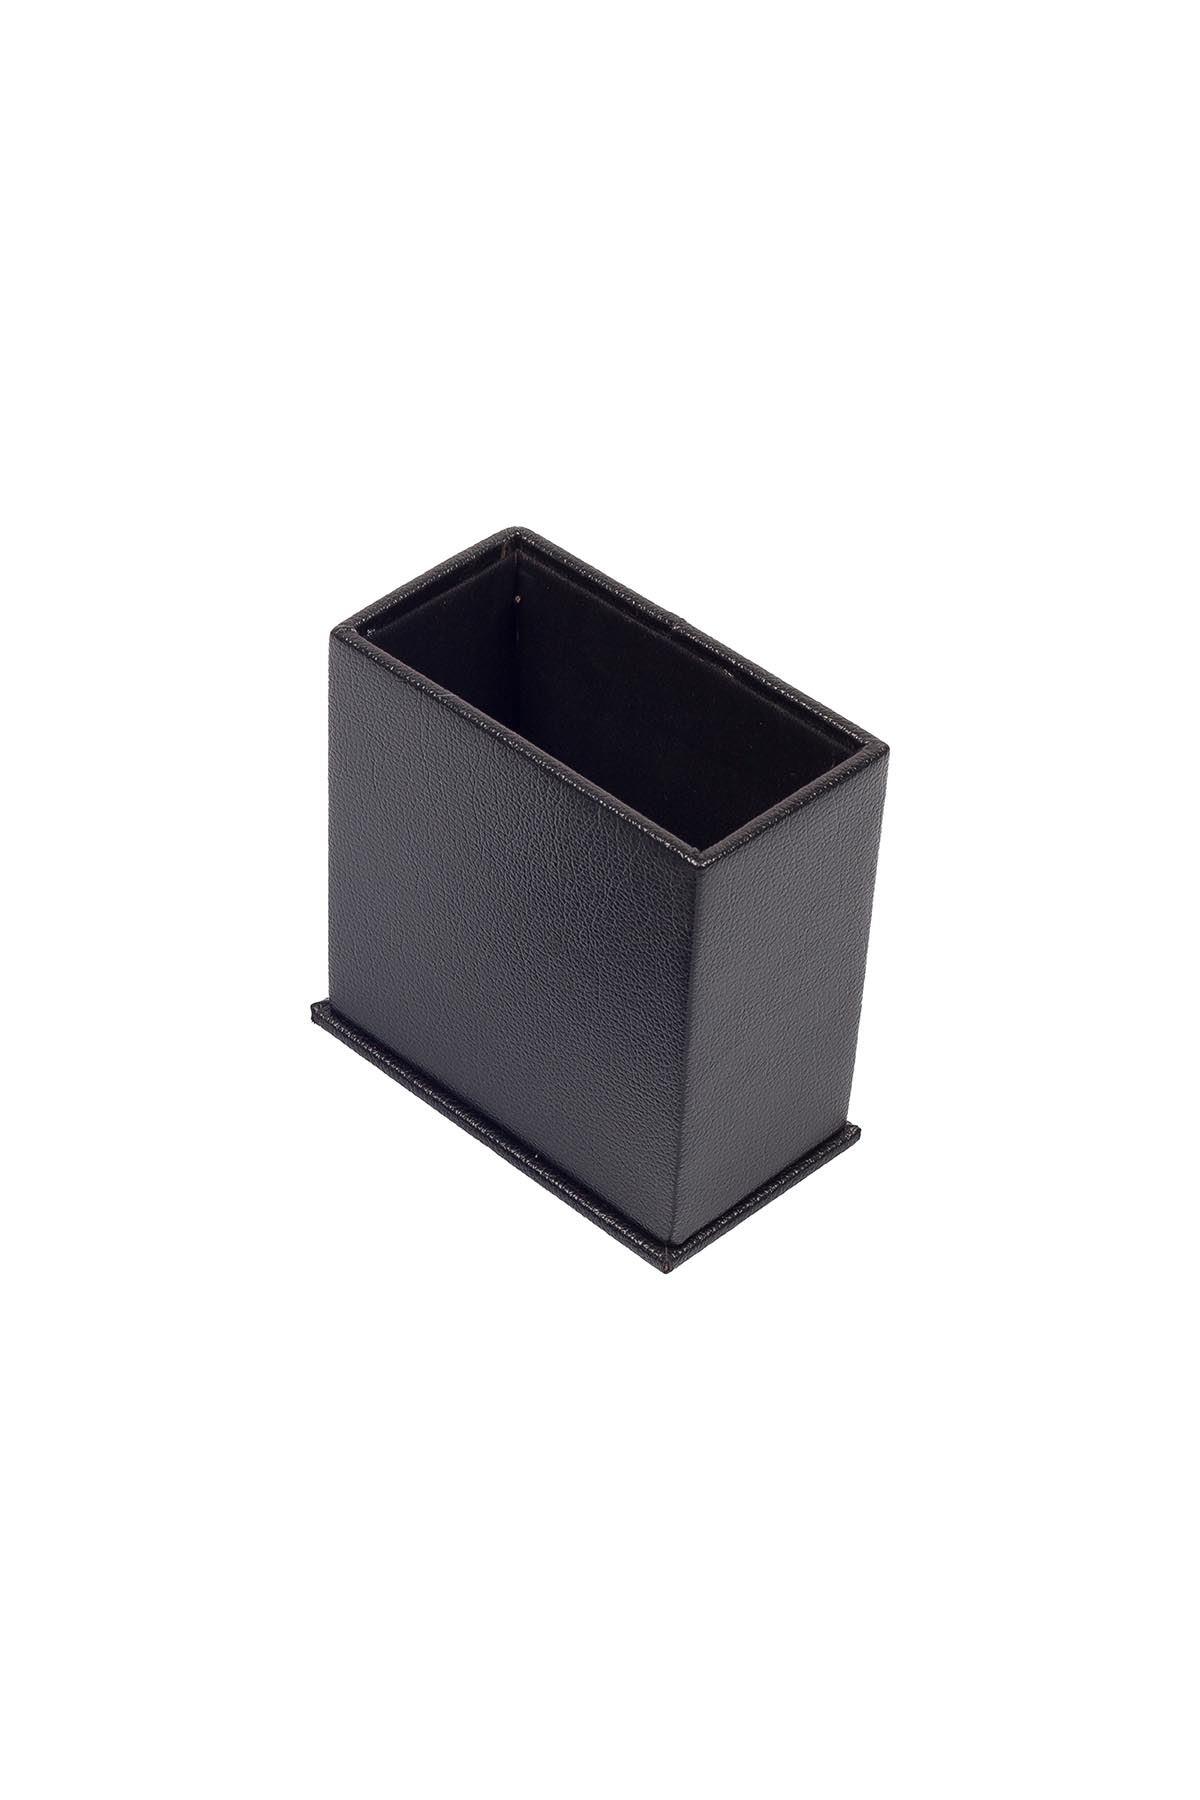 Make Your Own Desk Set Gray